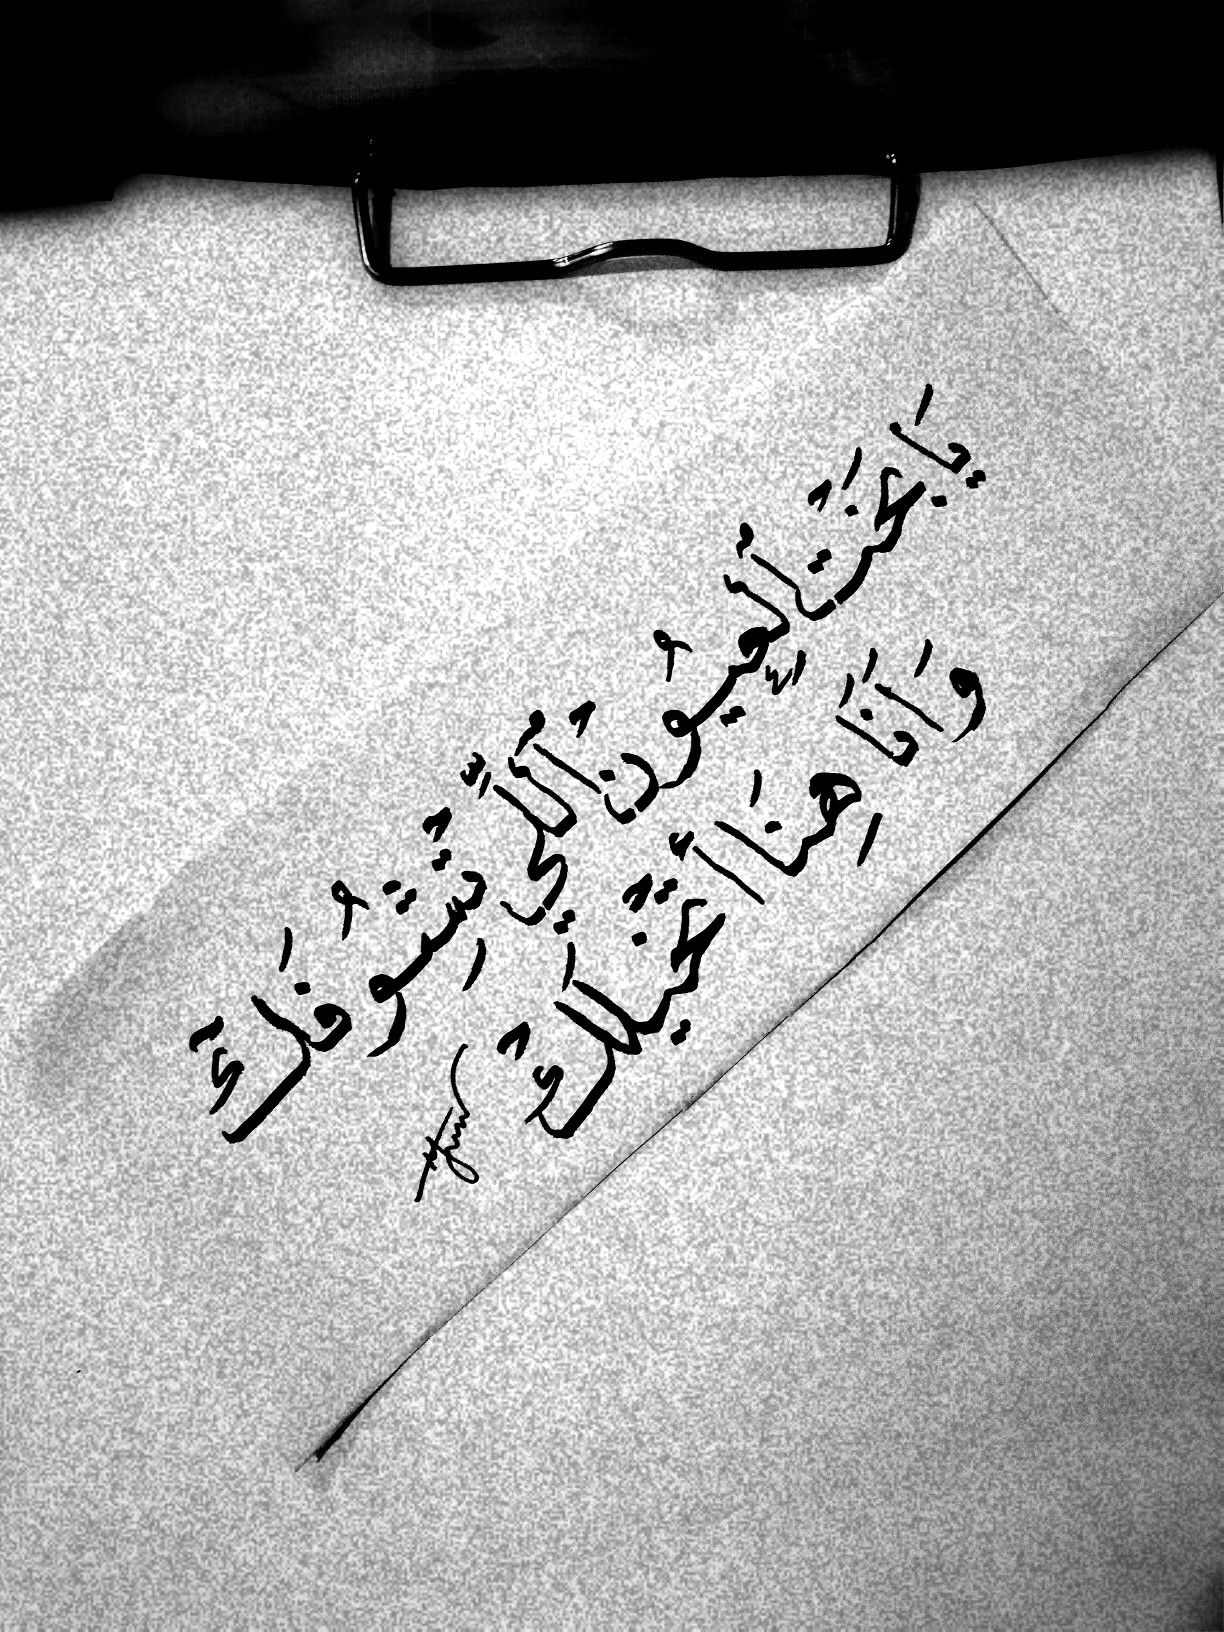 يابخت العيون اللي تشوفك وانا هنا اتخيلك Sweet Love Quotes Arabic Quotes Love Quotes